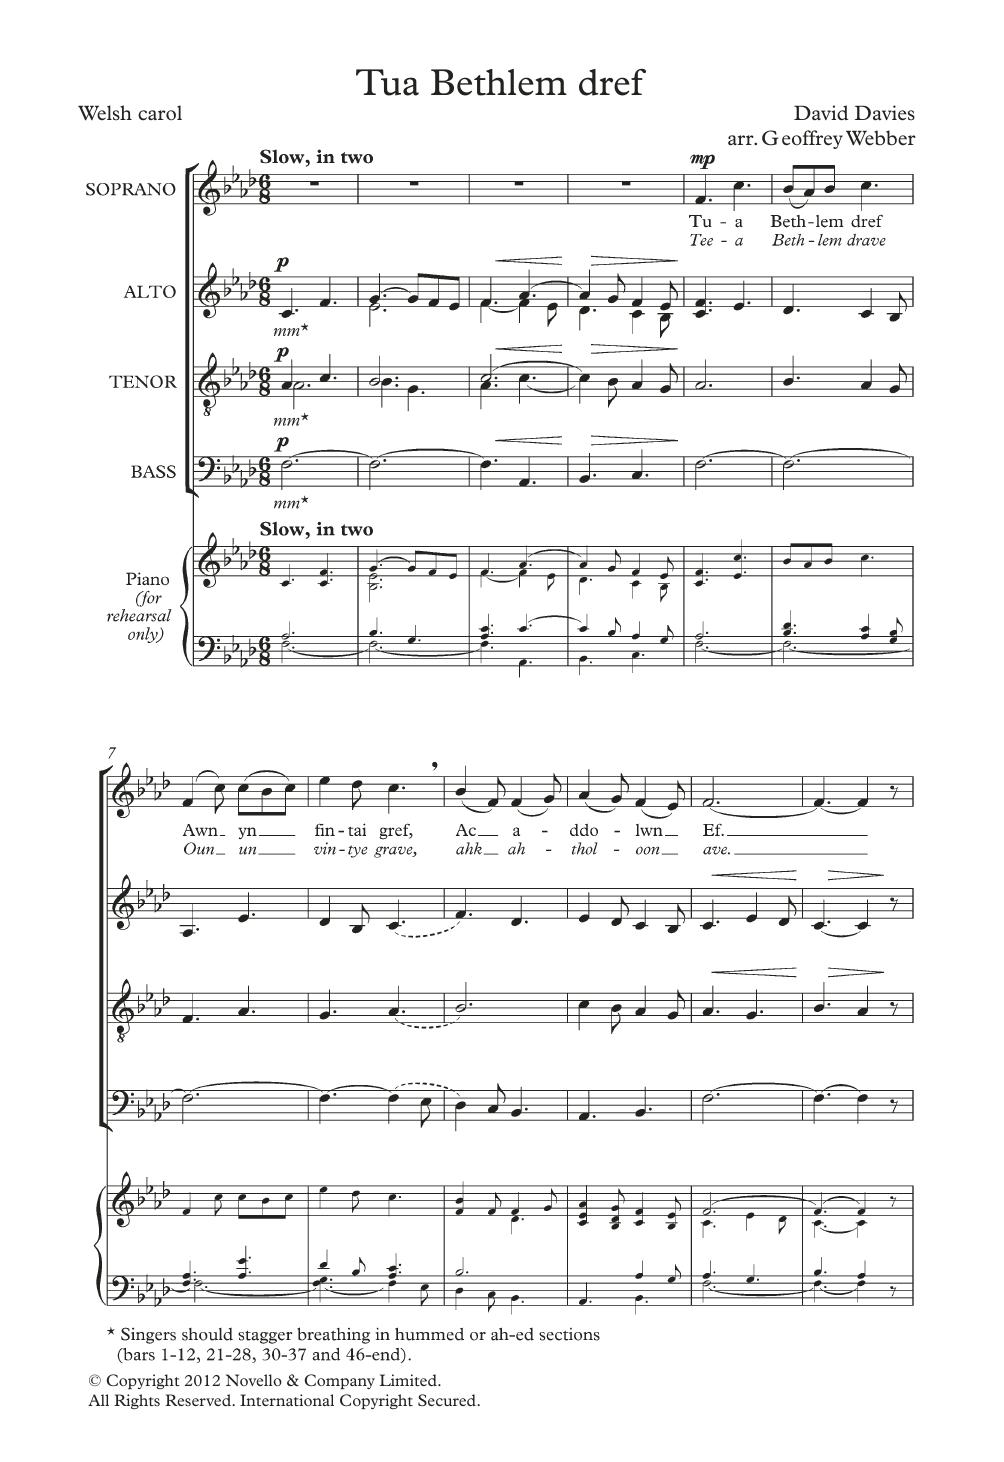 Tua Bethlem Dref (arr. Geoffrey Webber) Sheet Music